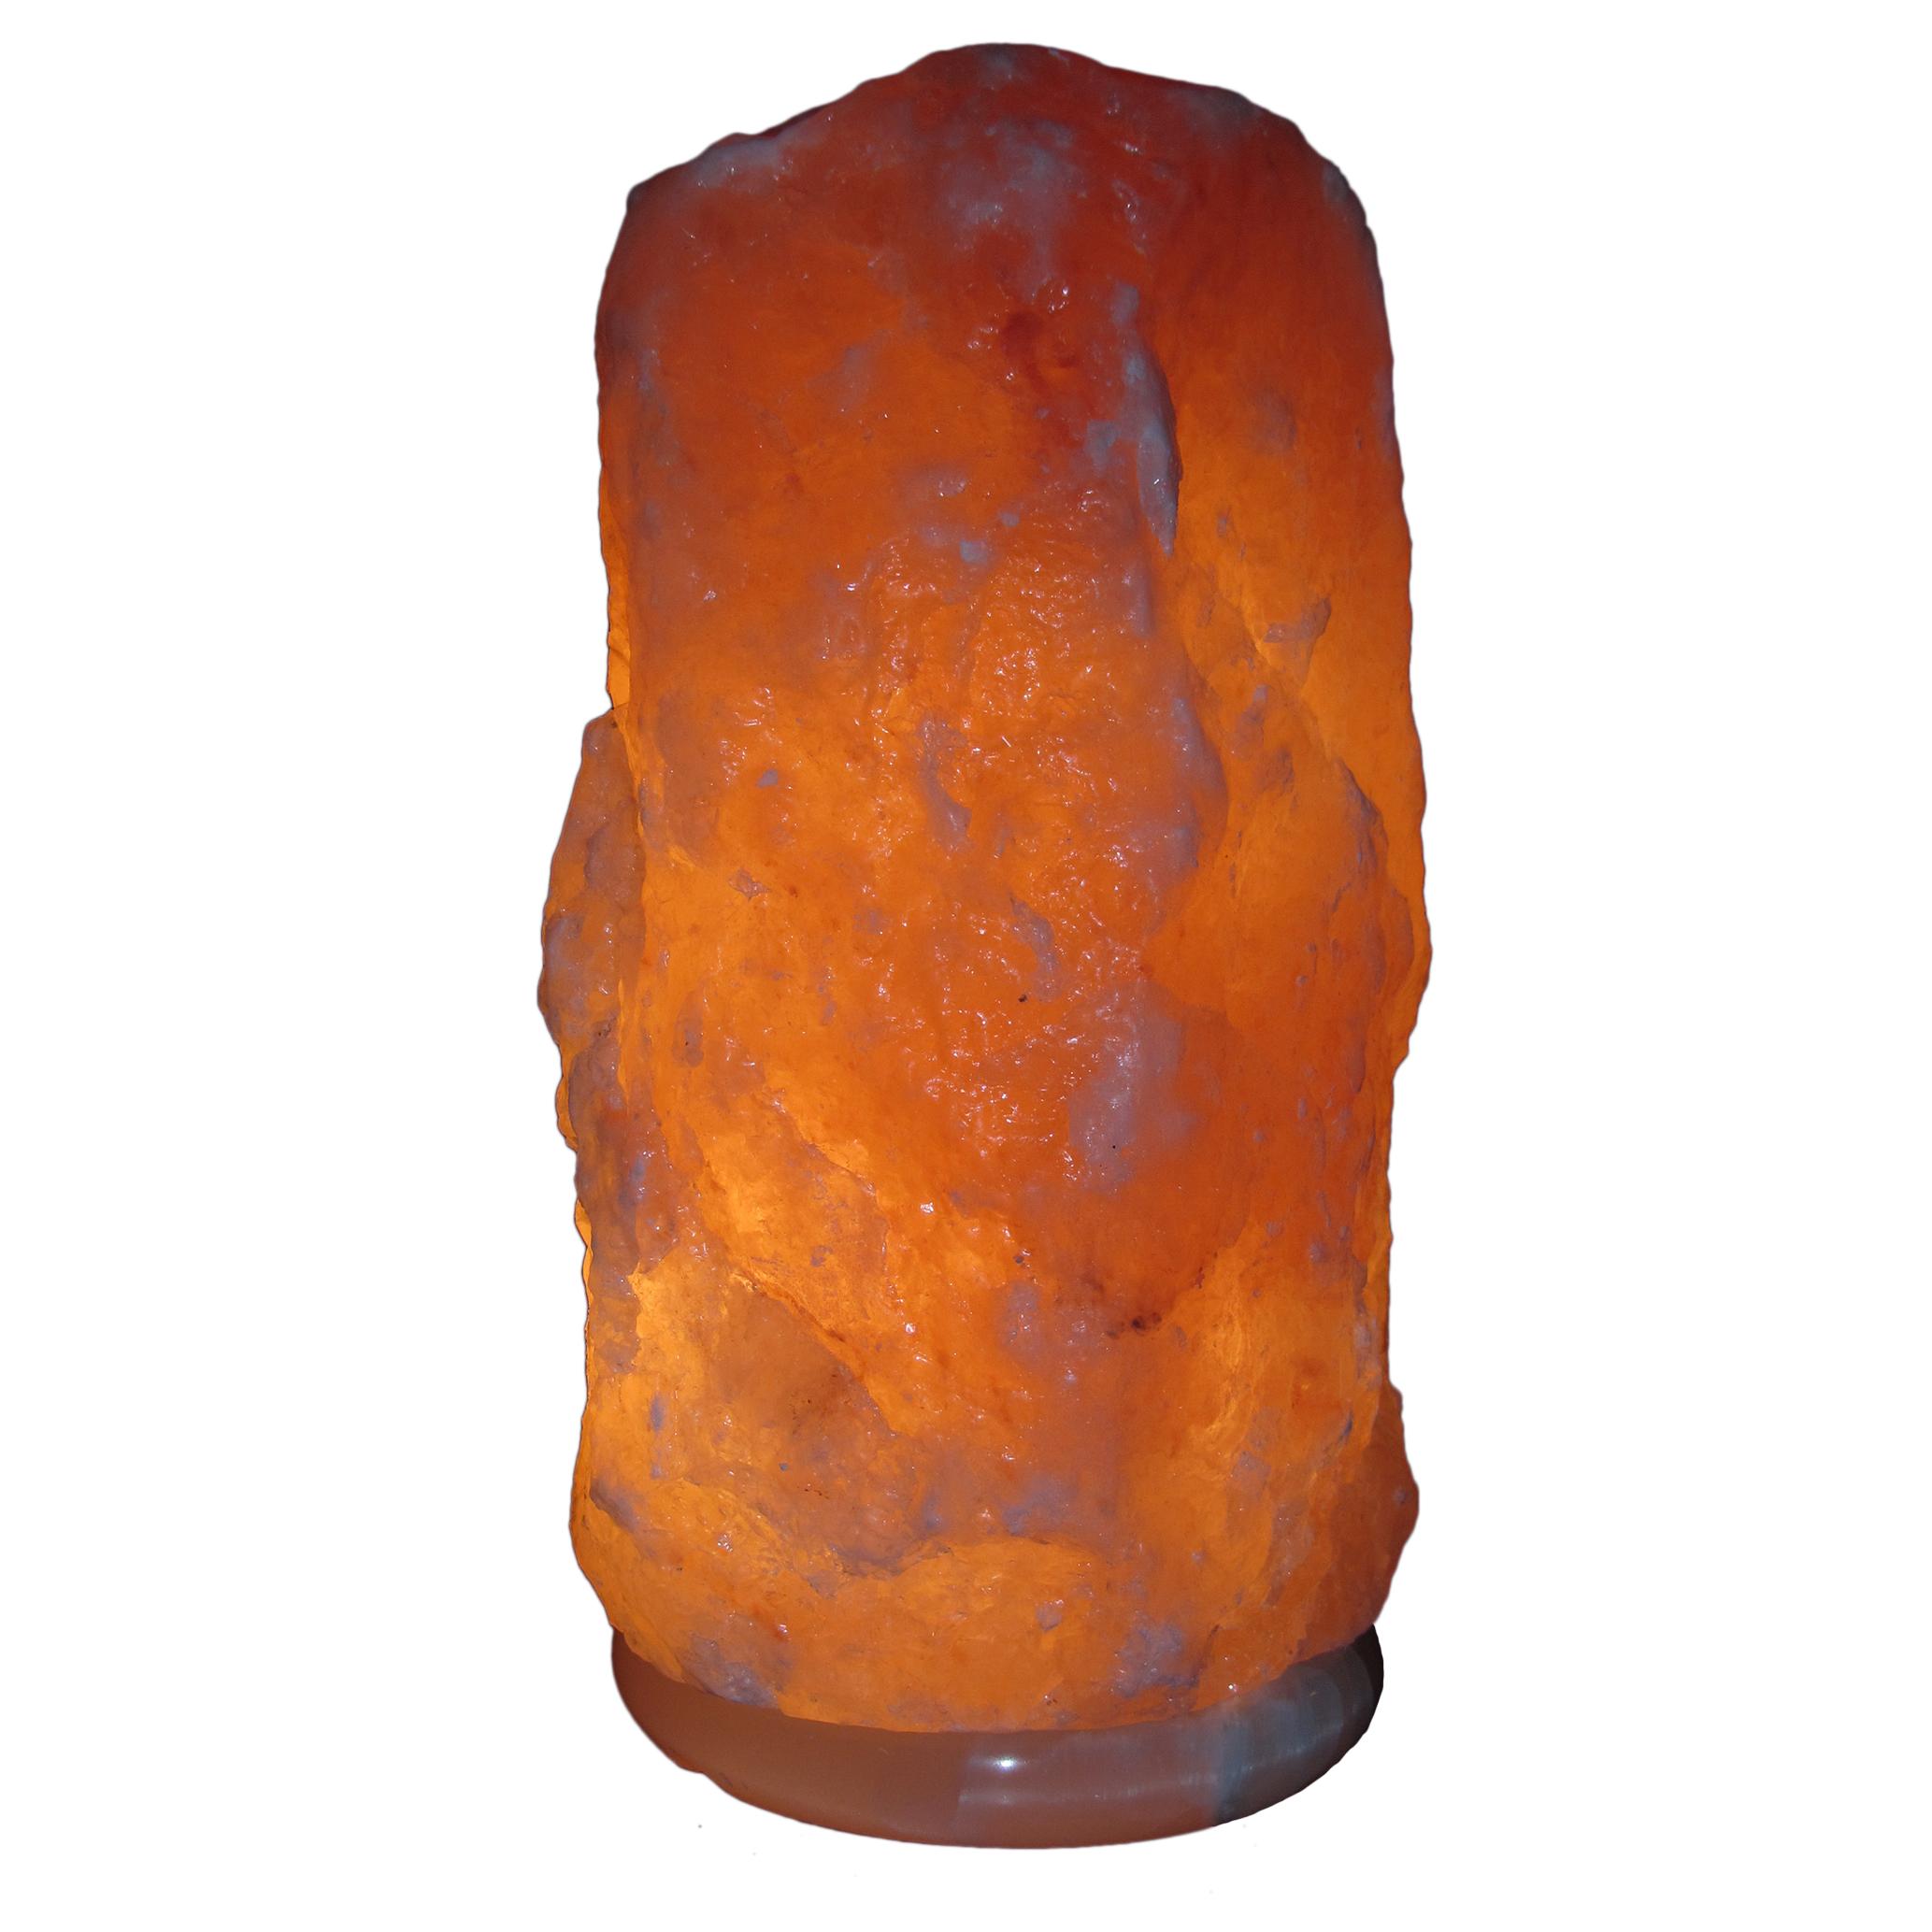 "Himalayan Rock Salt Natural Crystal Lamp, 11.5"" Tall – Soft Calm Therapeutic Light – Naturally Formed Salt Crystal Design On Onyx Marble Base – Tibetan Evaporated Rock Lamps – Dark Orange Hue"